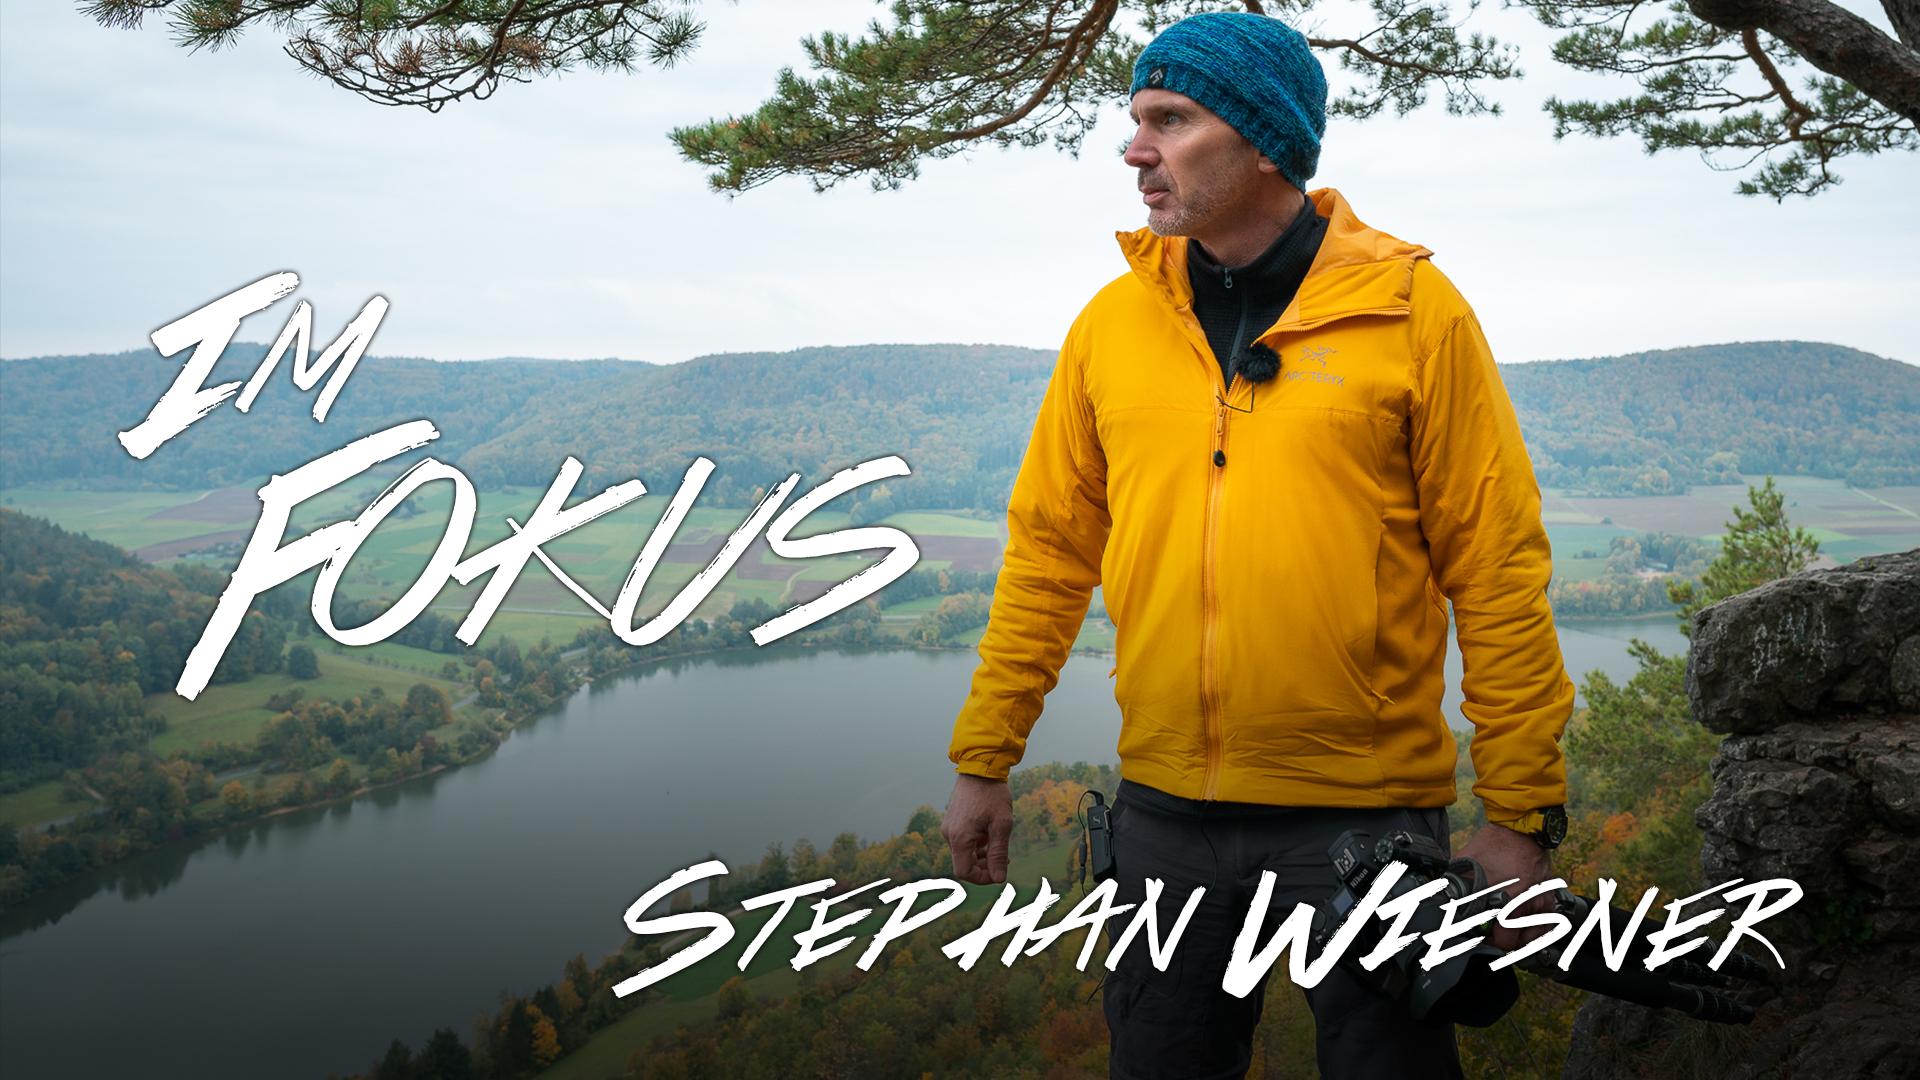 Stephan Wiesner im Fokus